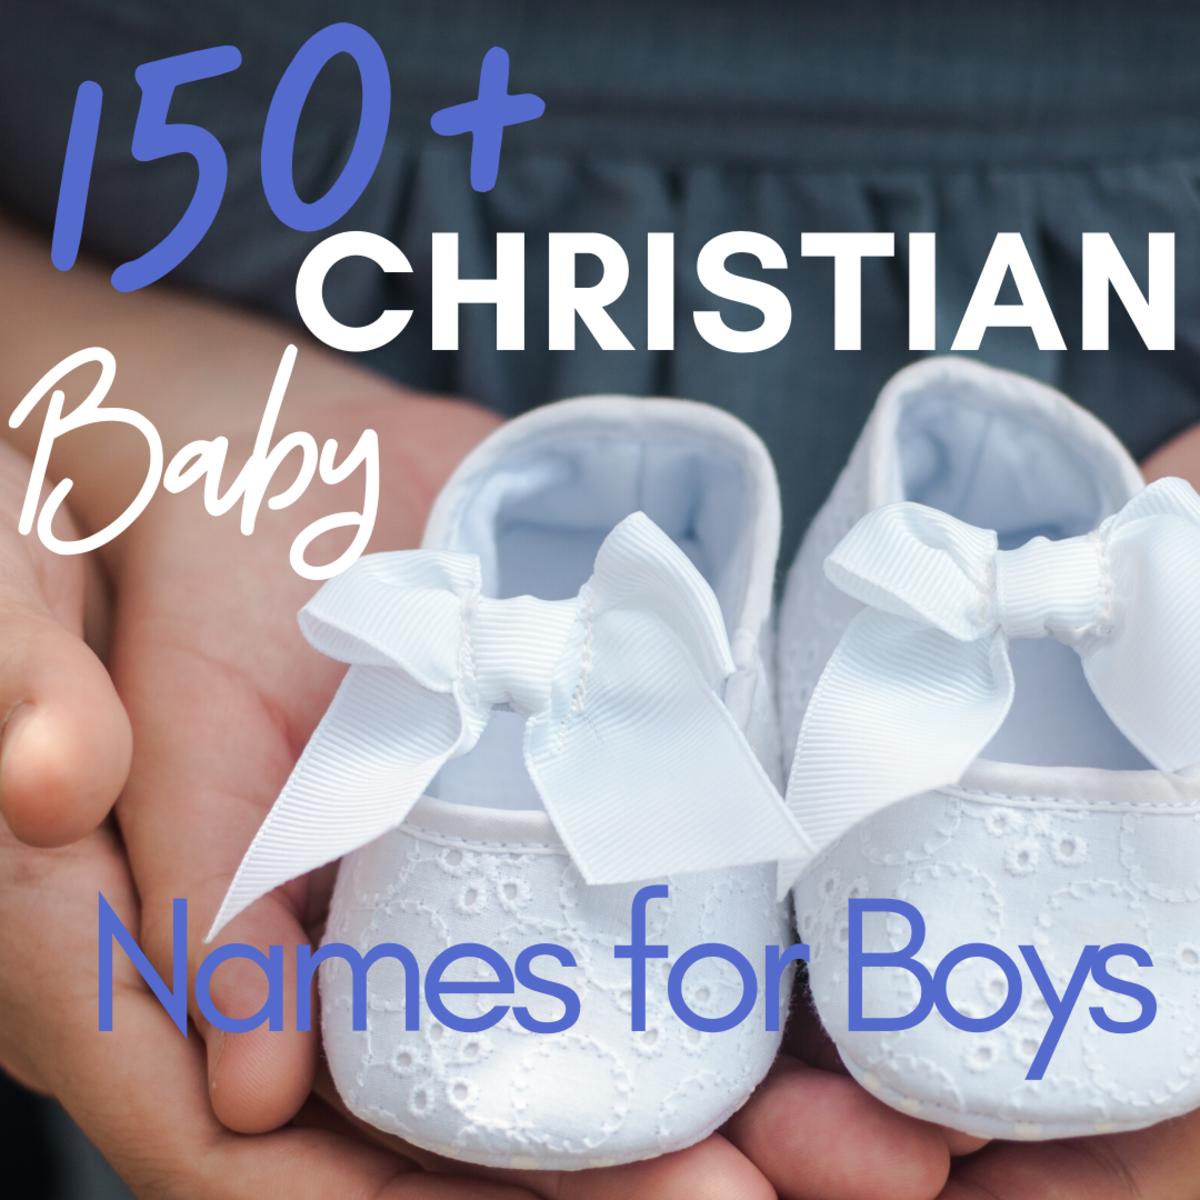 Christian Baby Names for Boys